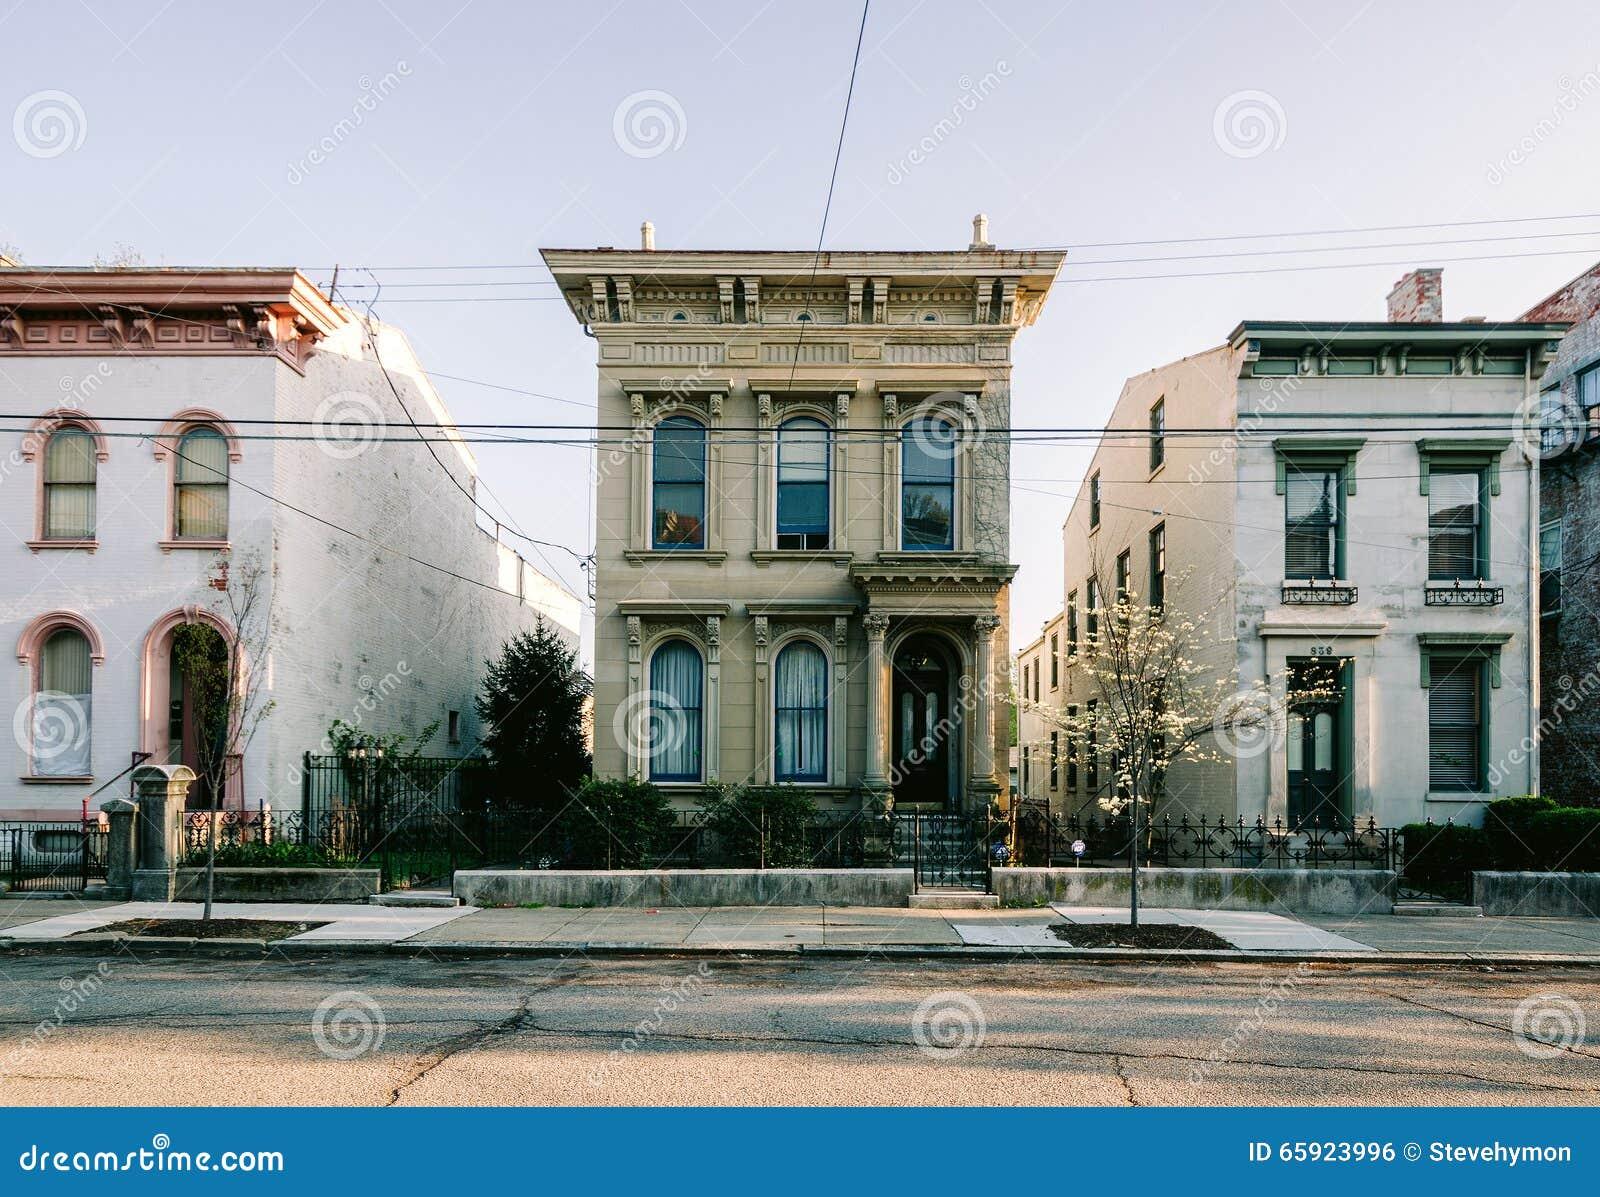 Houses in dayton ohio house plan 2017 for Ohio homebuilders